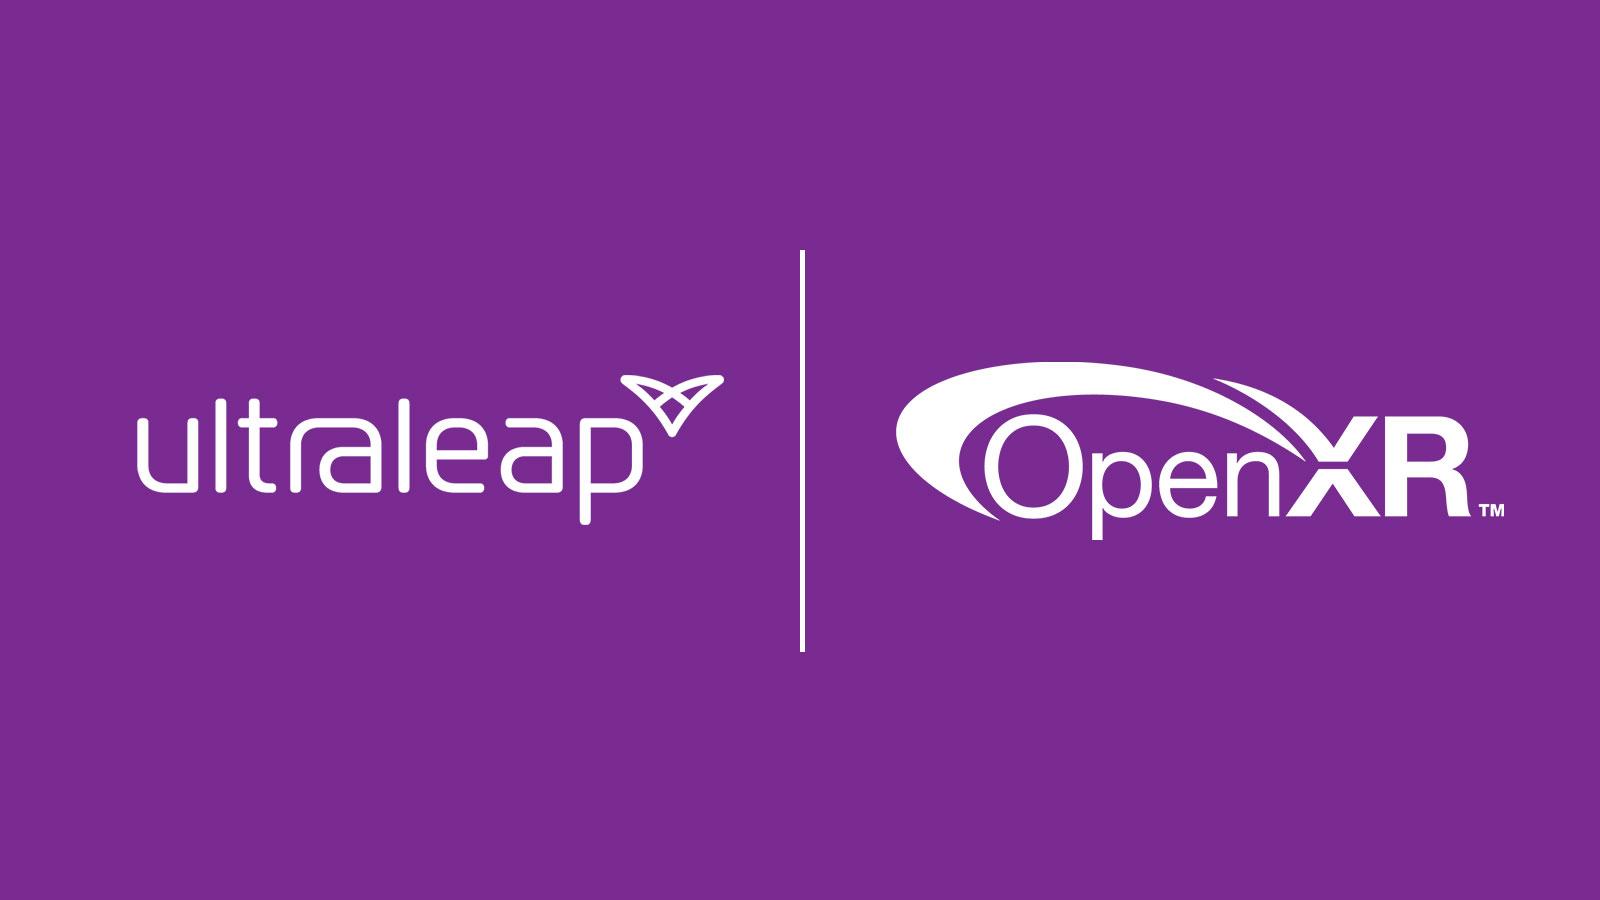 Ultraleap and OpenXR logos